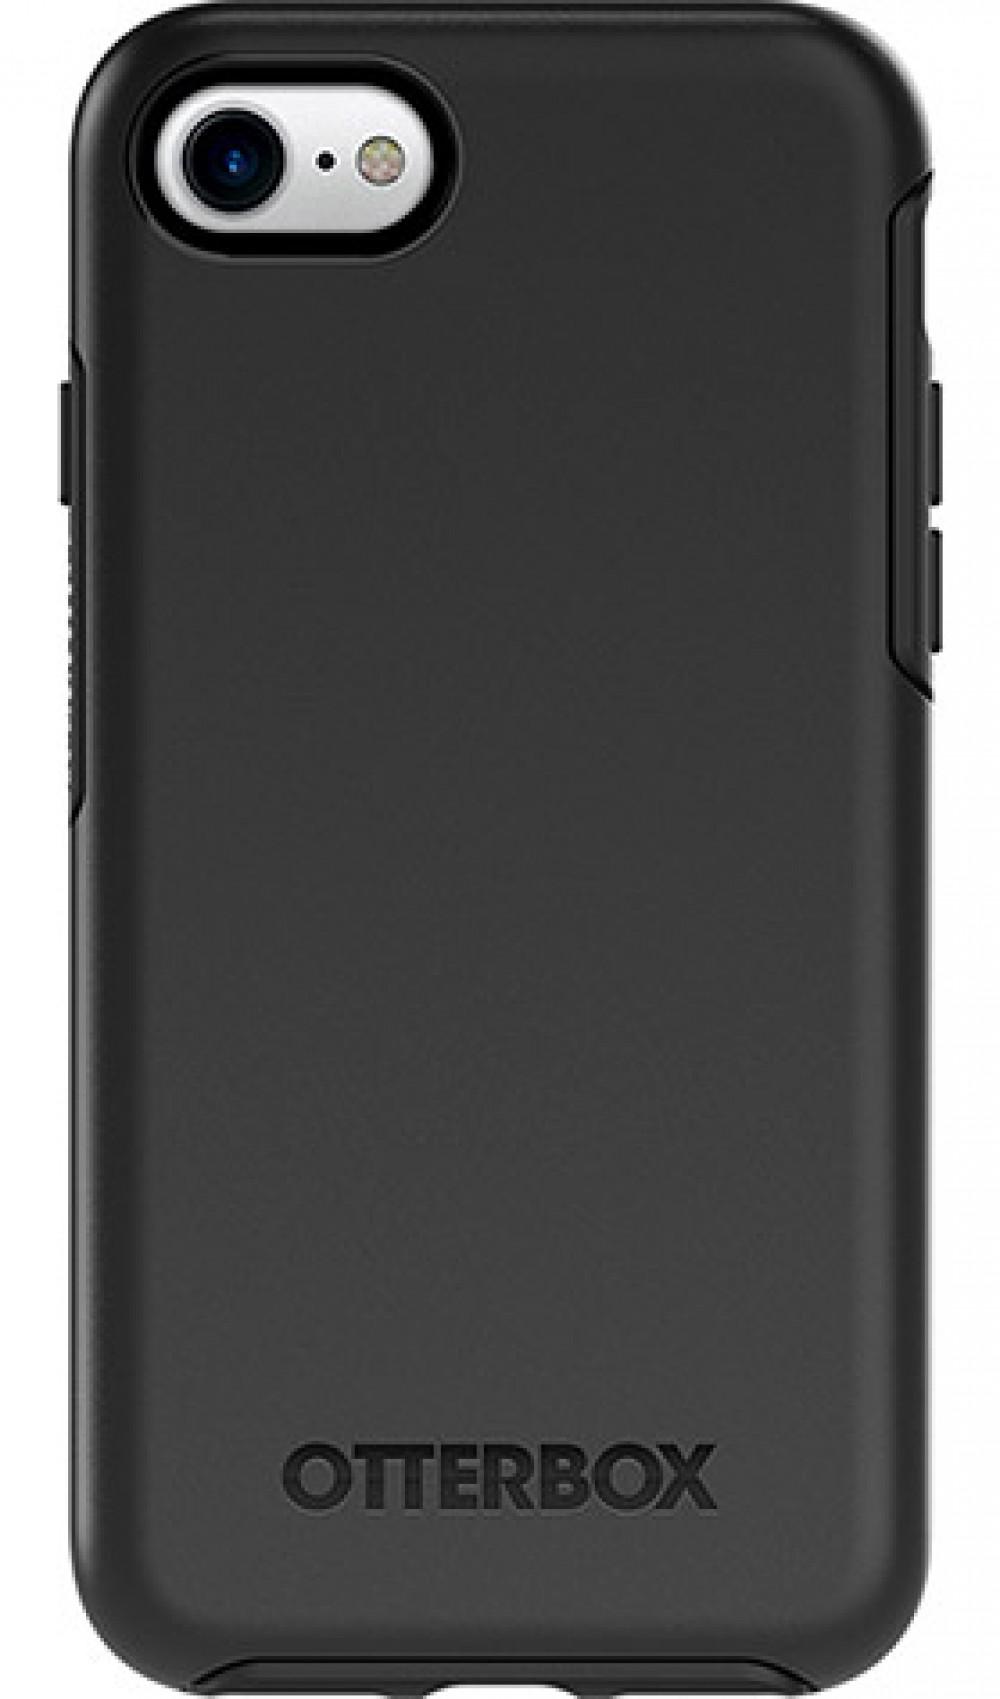 Otterbox case iPhone SE (gen. 2), iPhone 8/7 Black